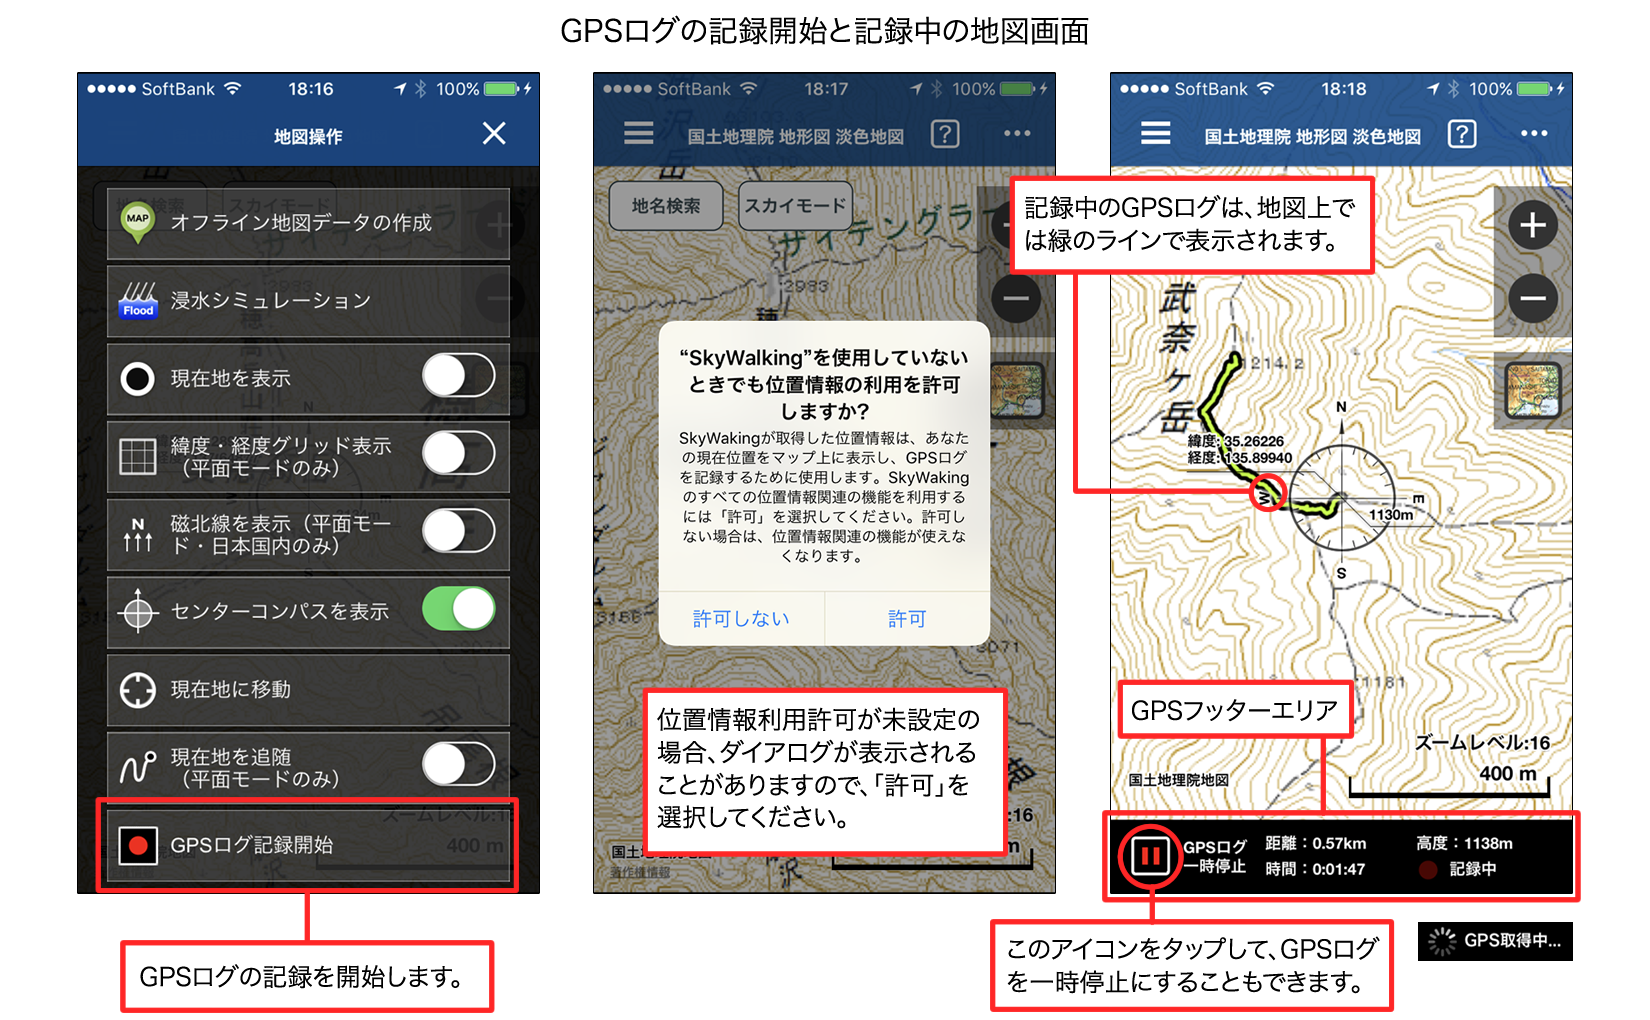 GPSログの記録開始と記録中の地図画面